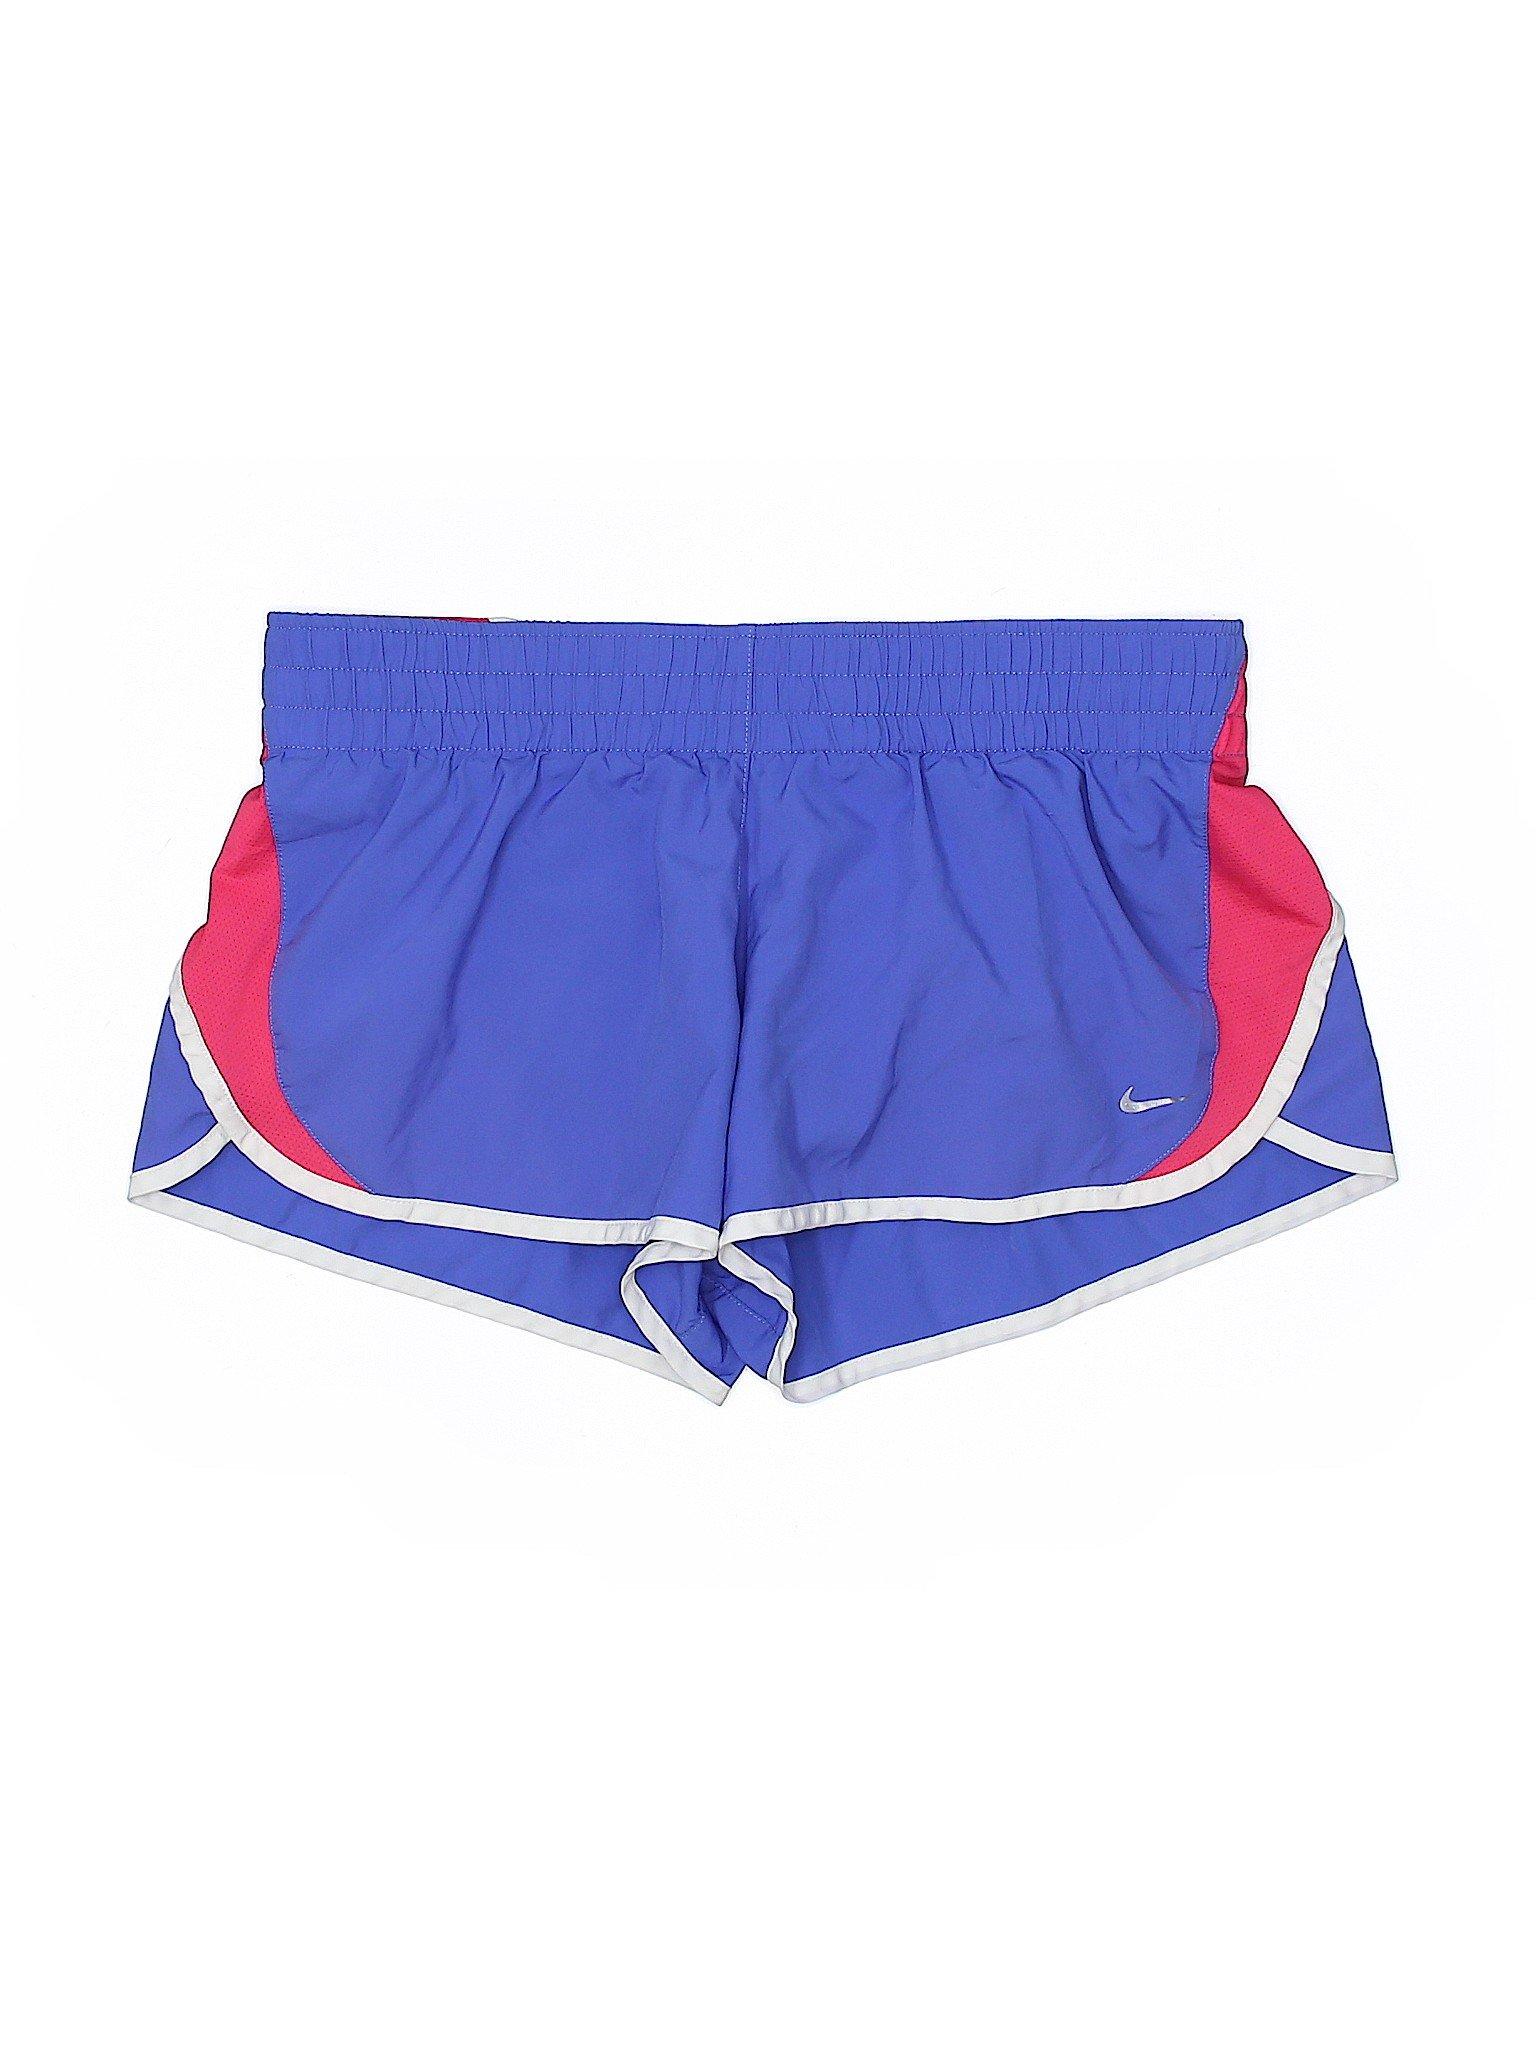 Nike Shorts Boutique Boutique Nike Athletic Athletic USpHt0w